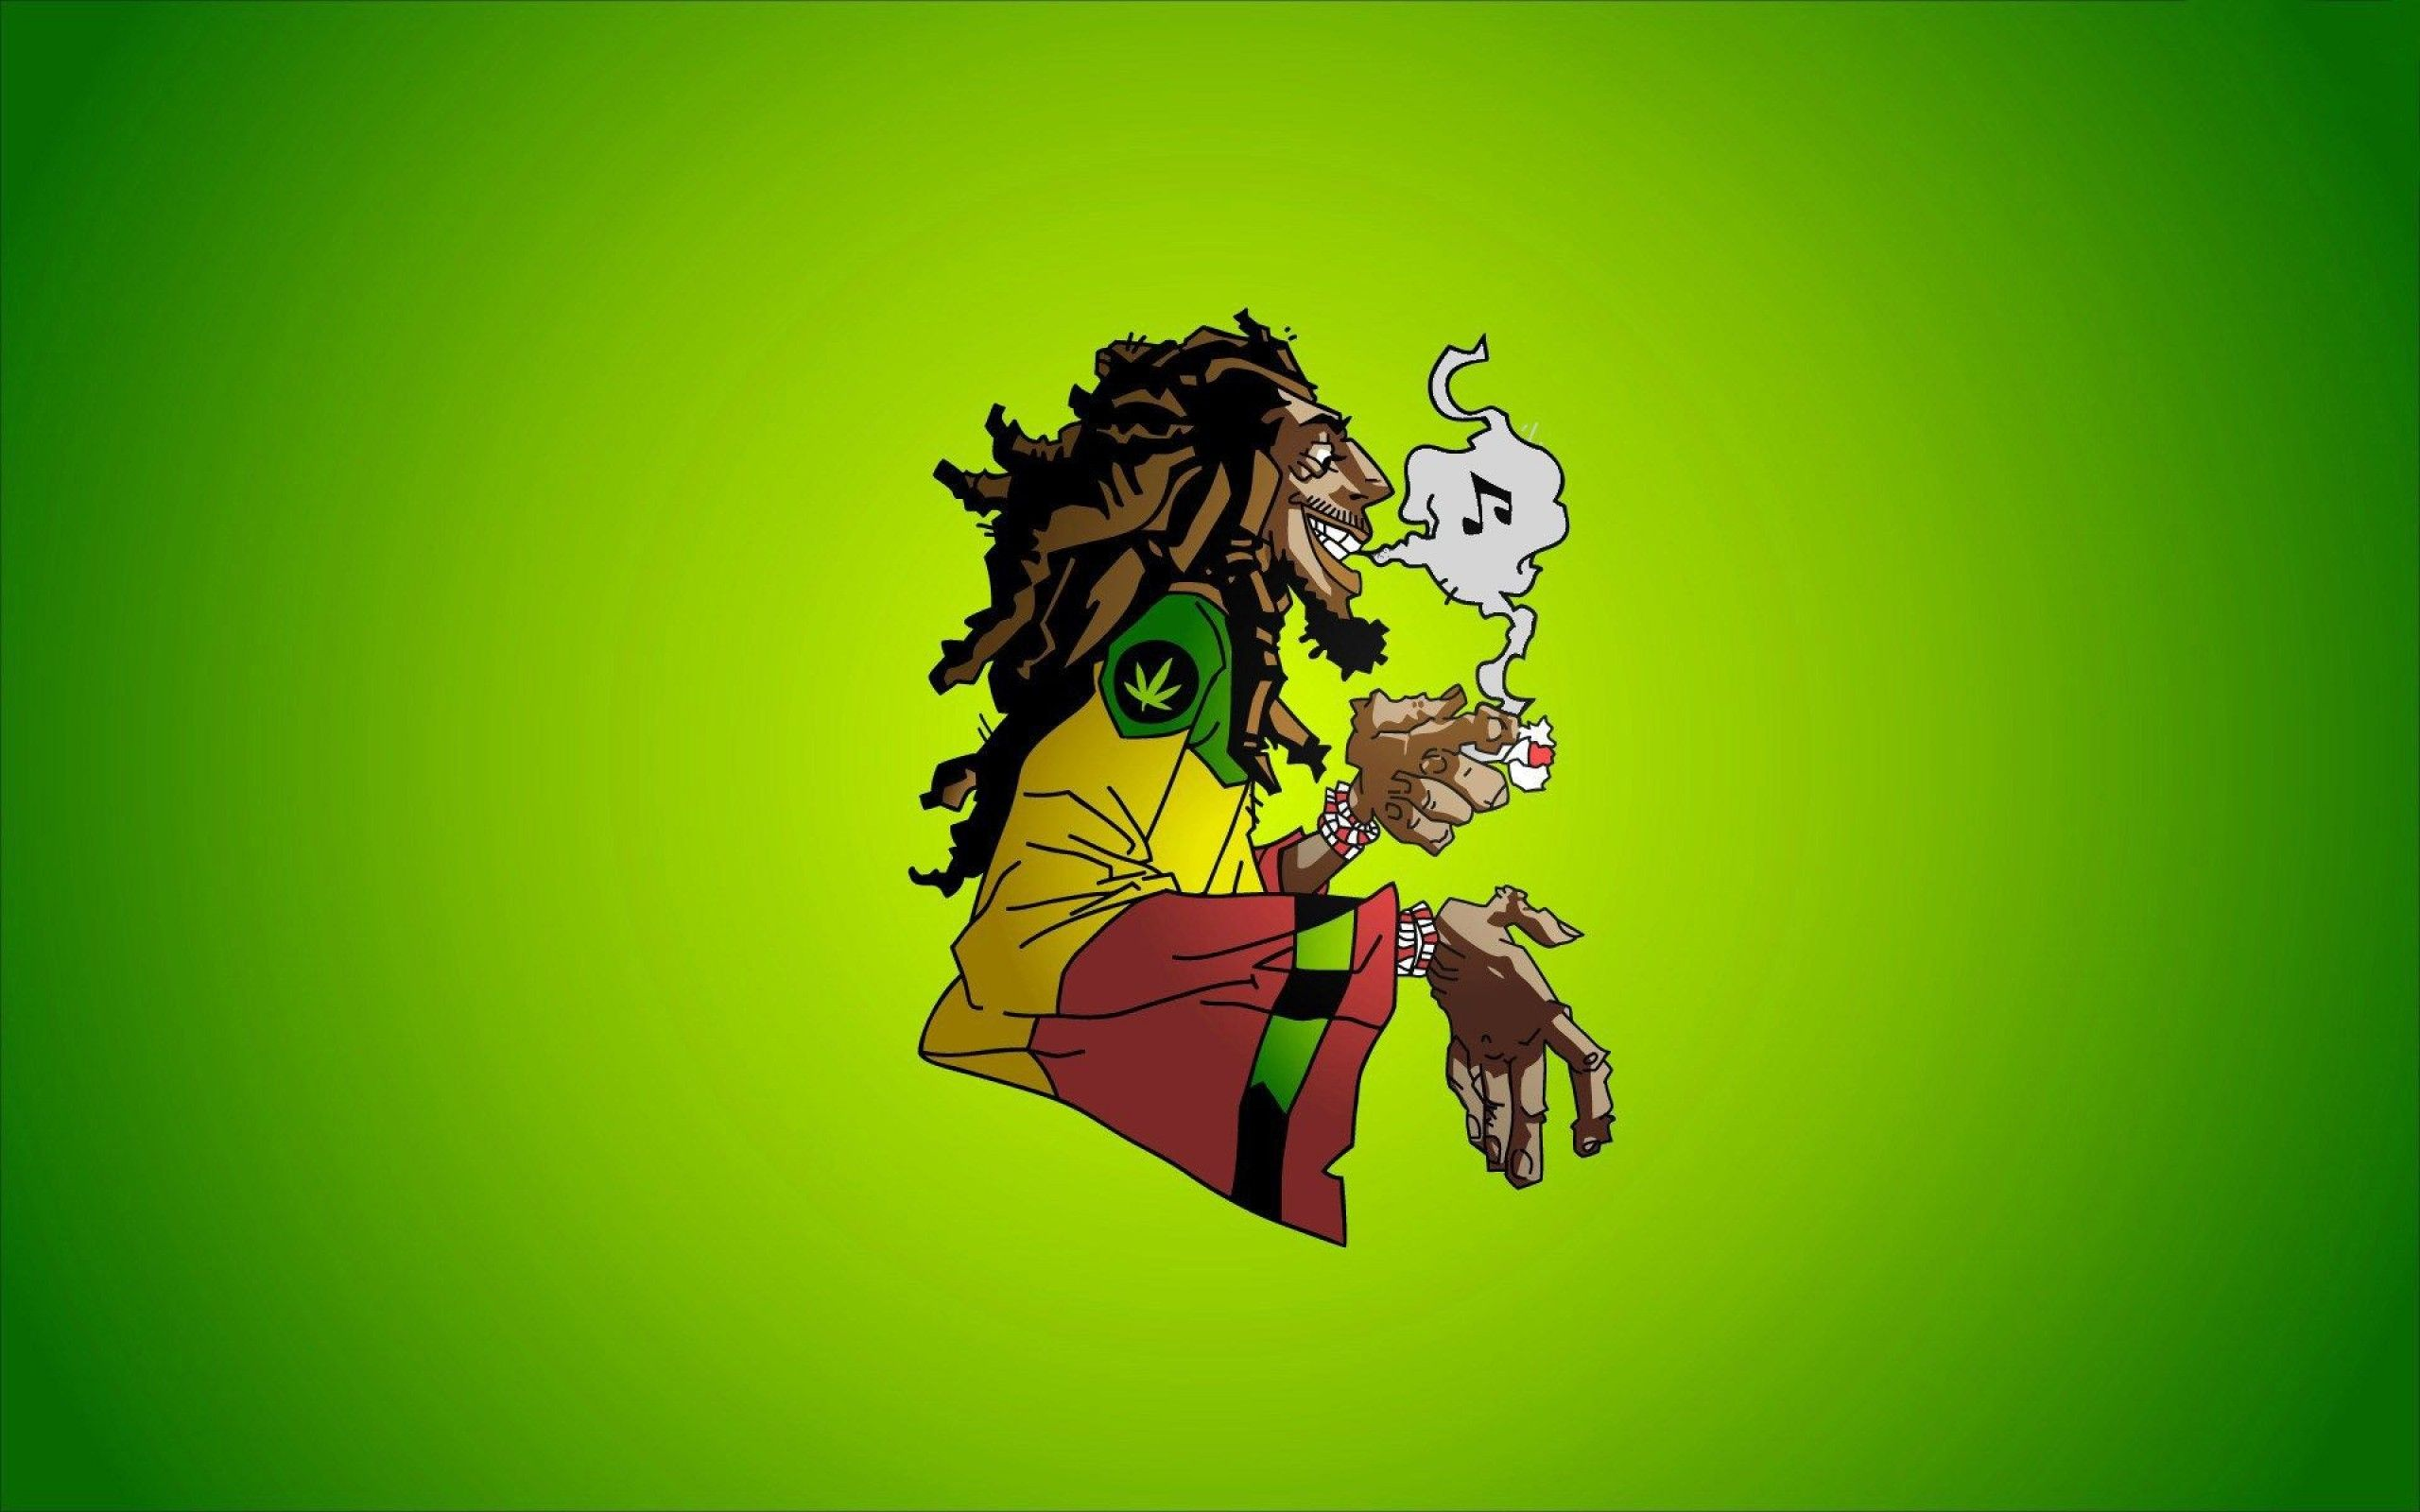 Bob Marley Cartoon Drawings Widescreen Wallpaper 2560 1600 Reggae Wallpapers Reggae Music Art Bob Marley Cartoon